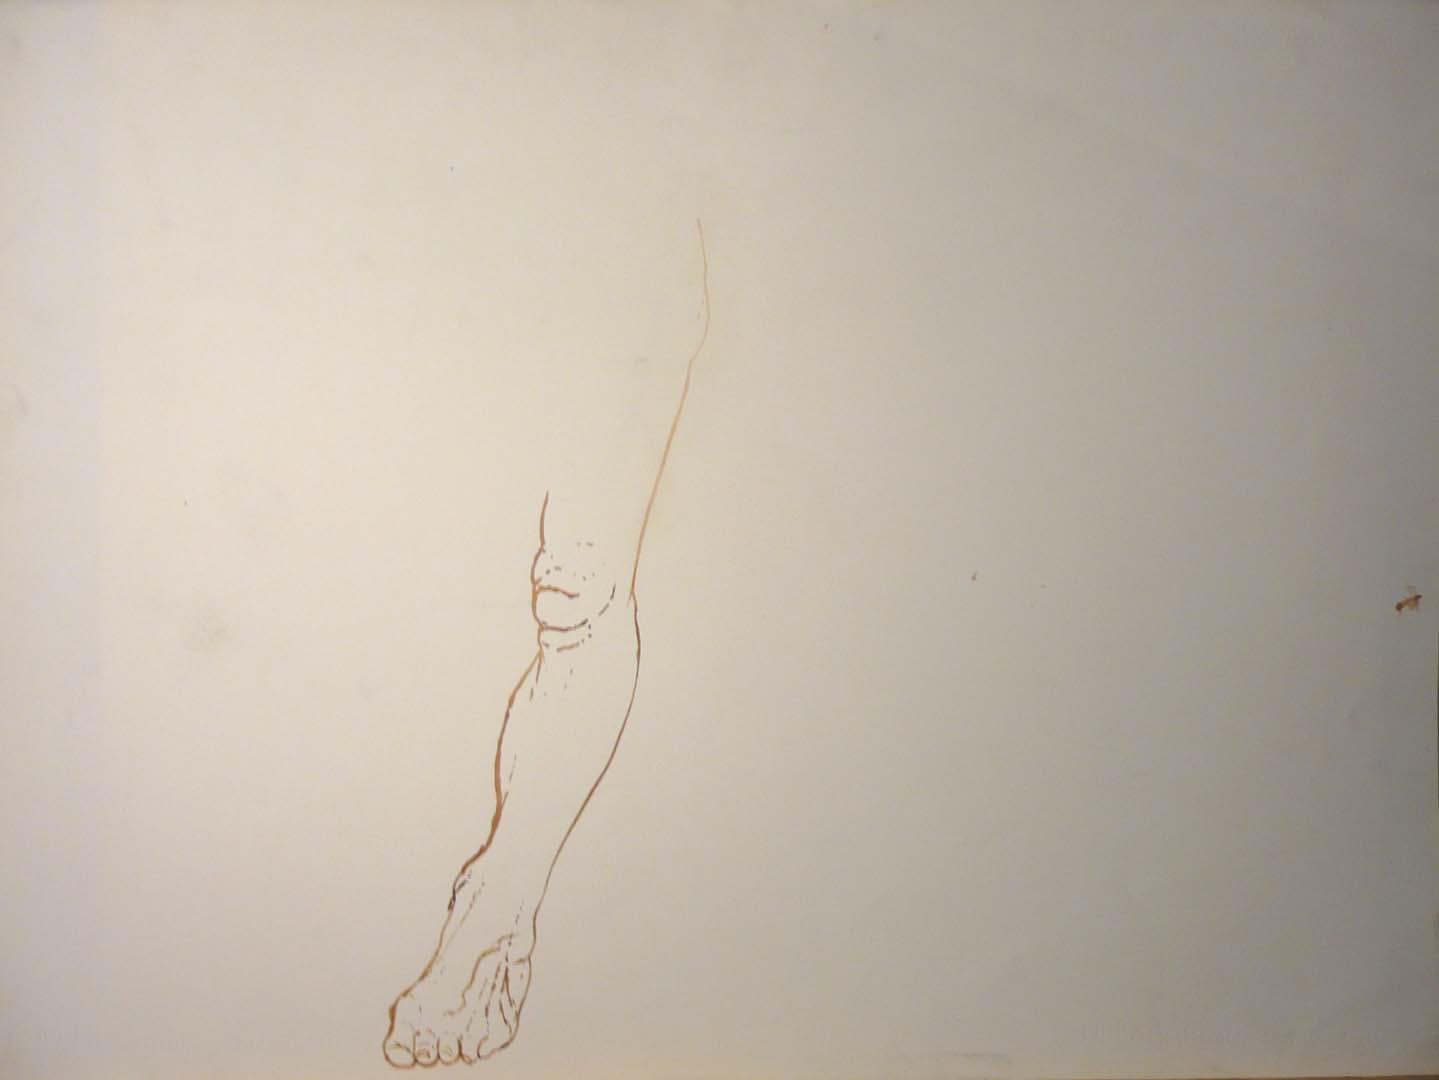 Leg Sepia 22 x 29.875